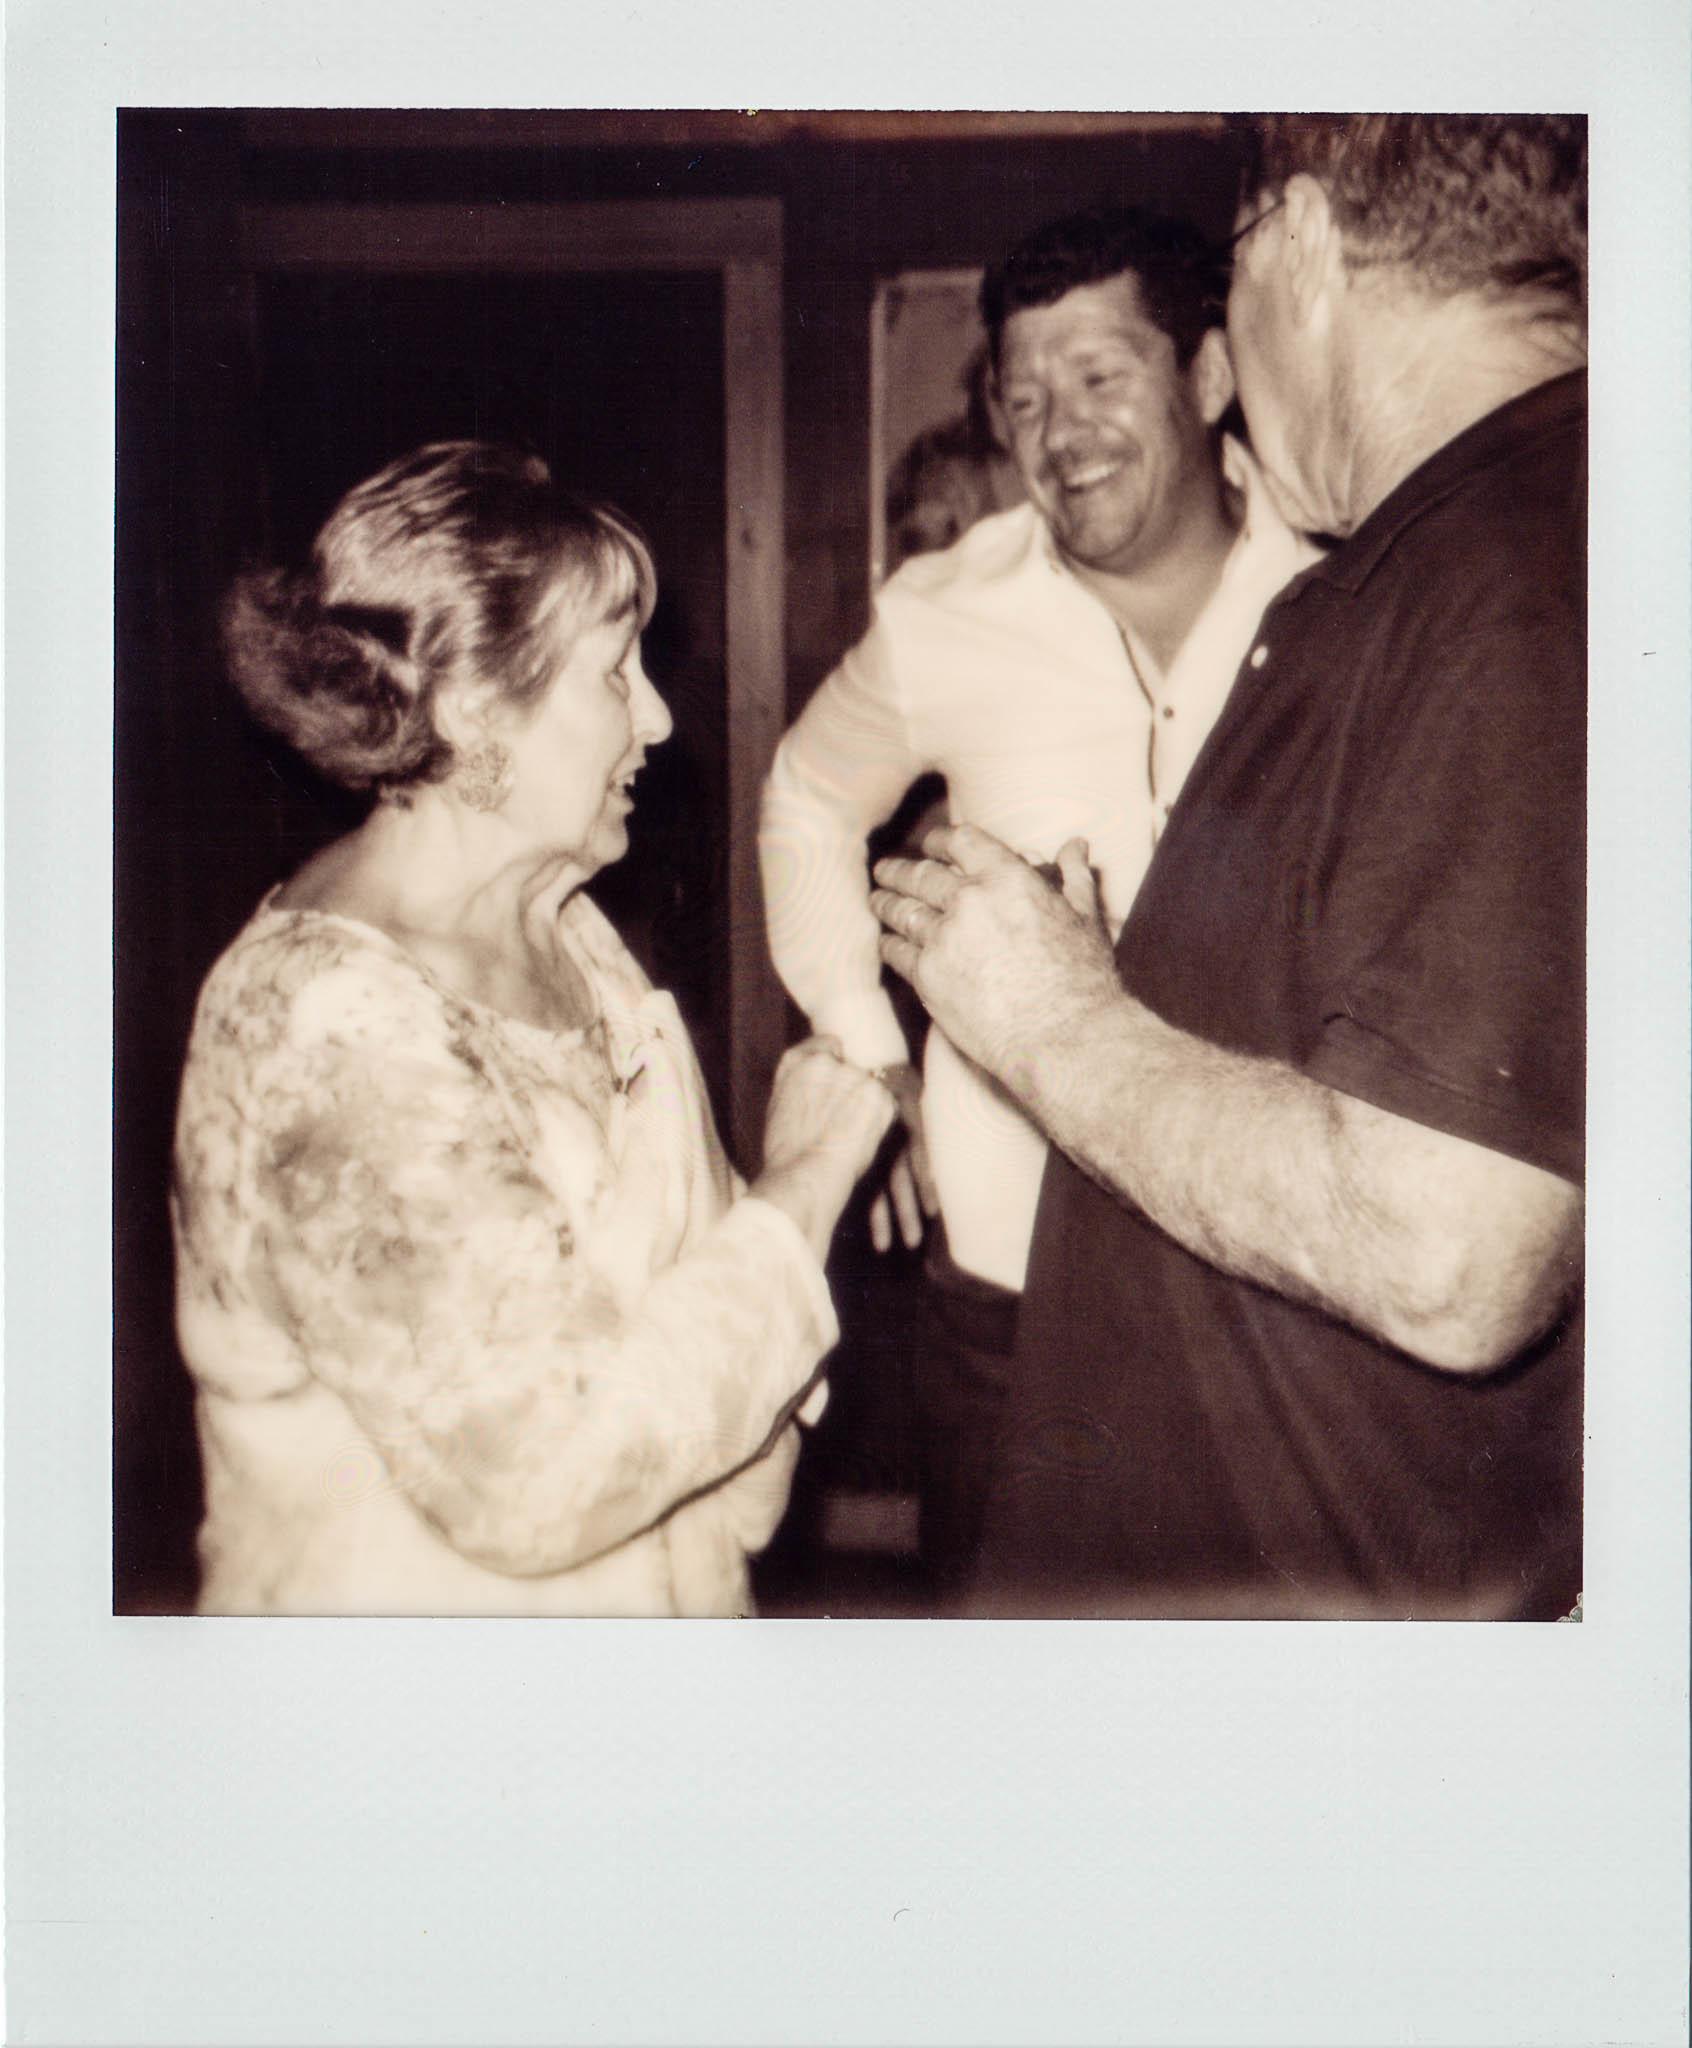 Linda Updike talking with friends at Wallys Mills Avenue Liquors.